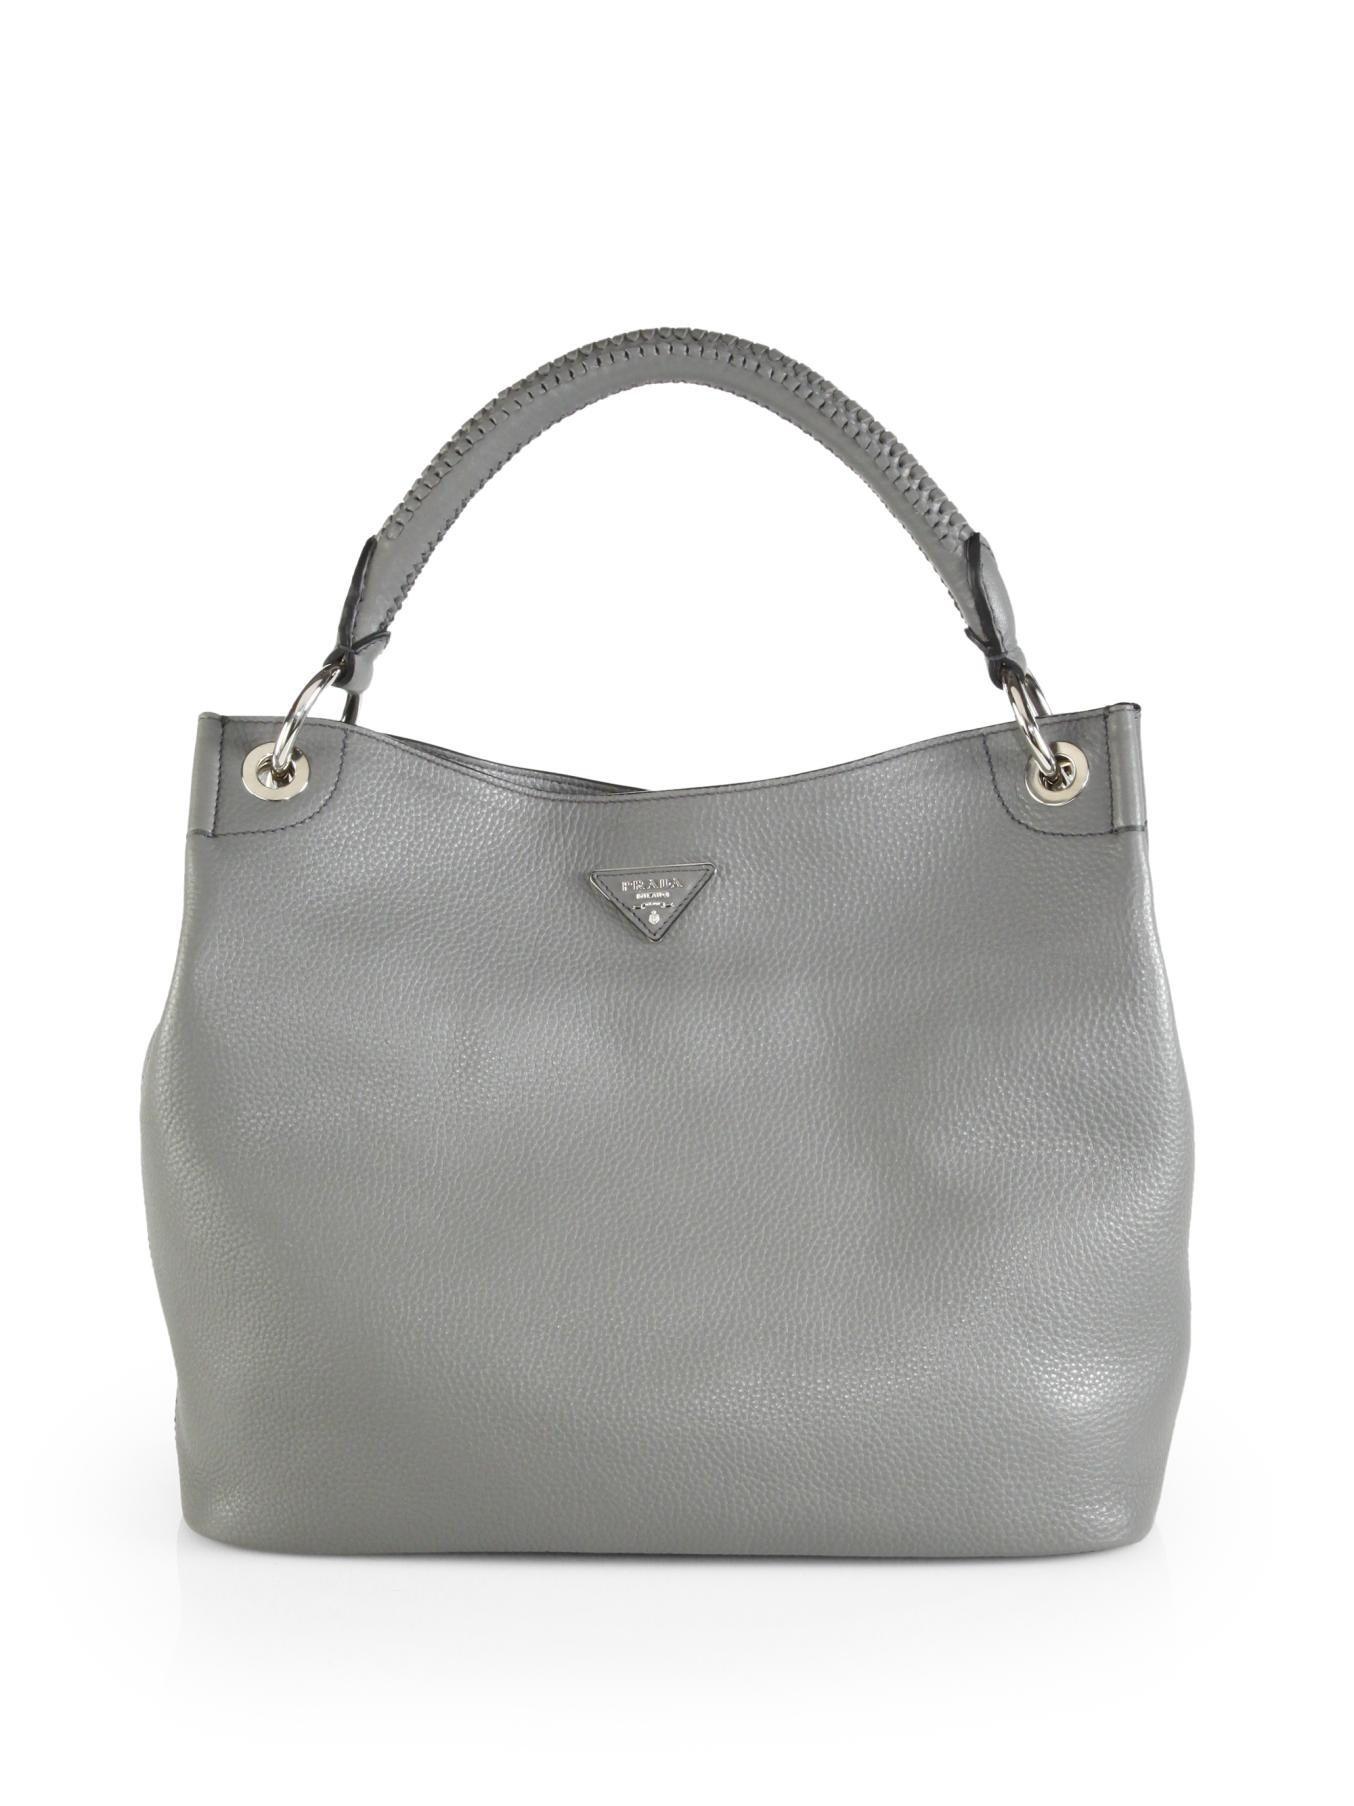 Lyst - Prada Vitello Daino Hobo Bag in Gray cf123bda96